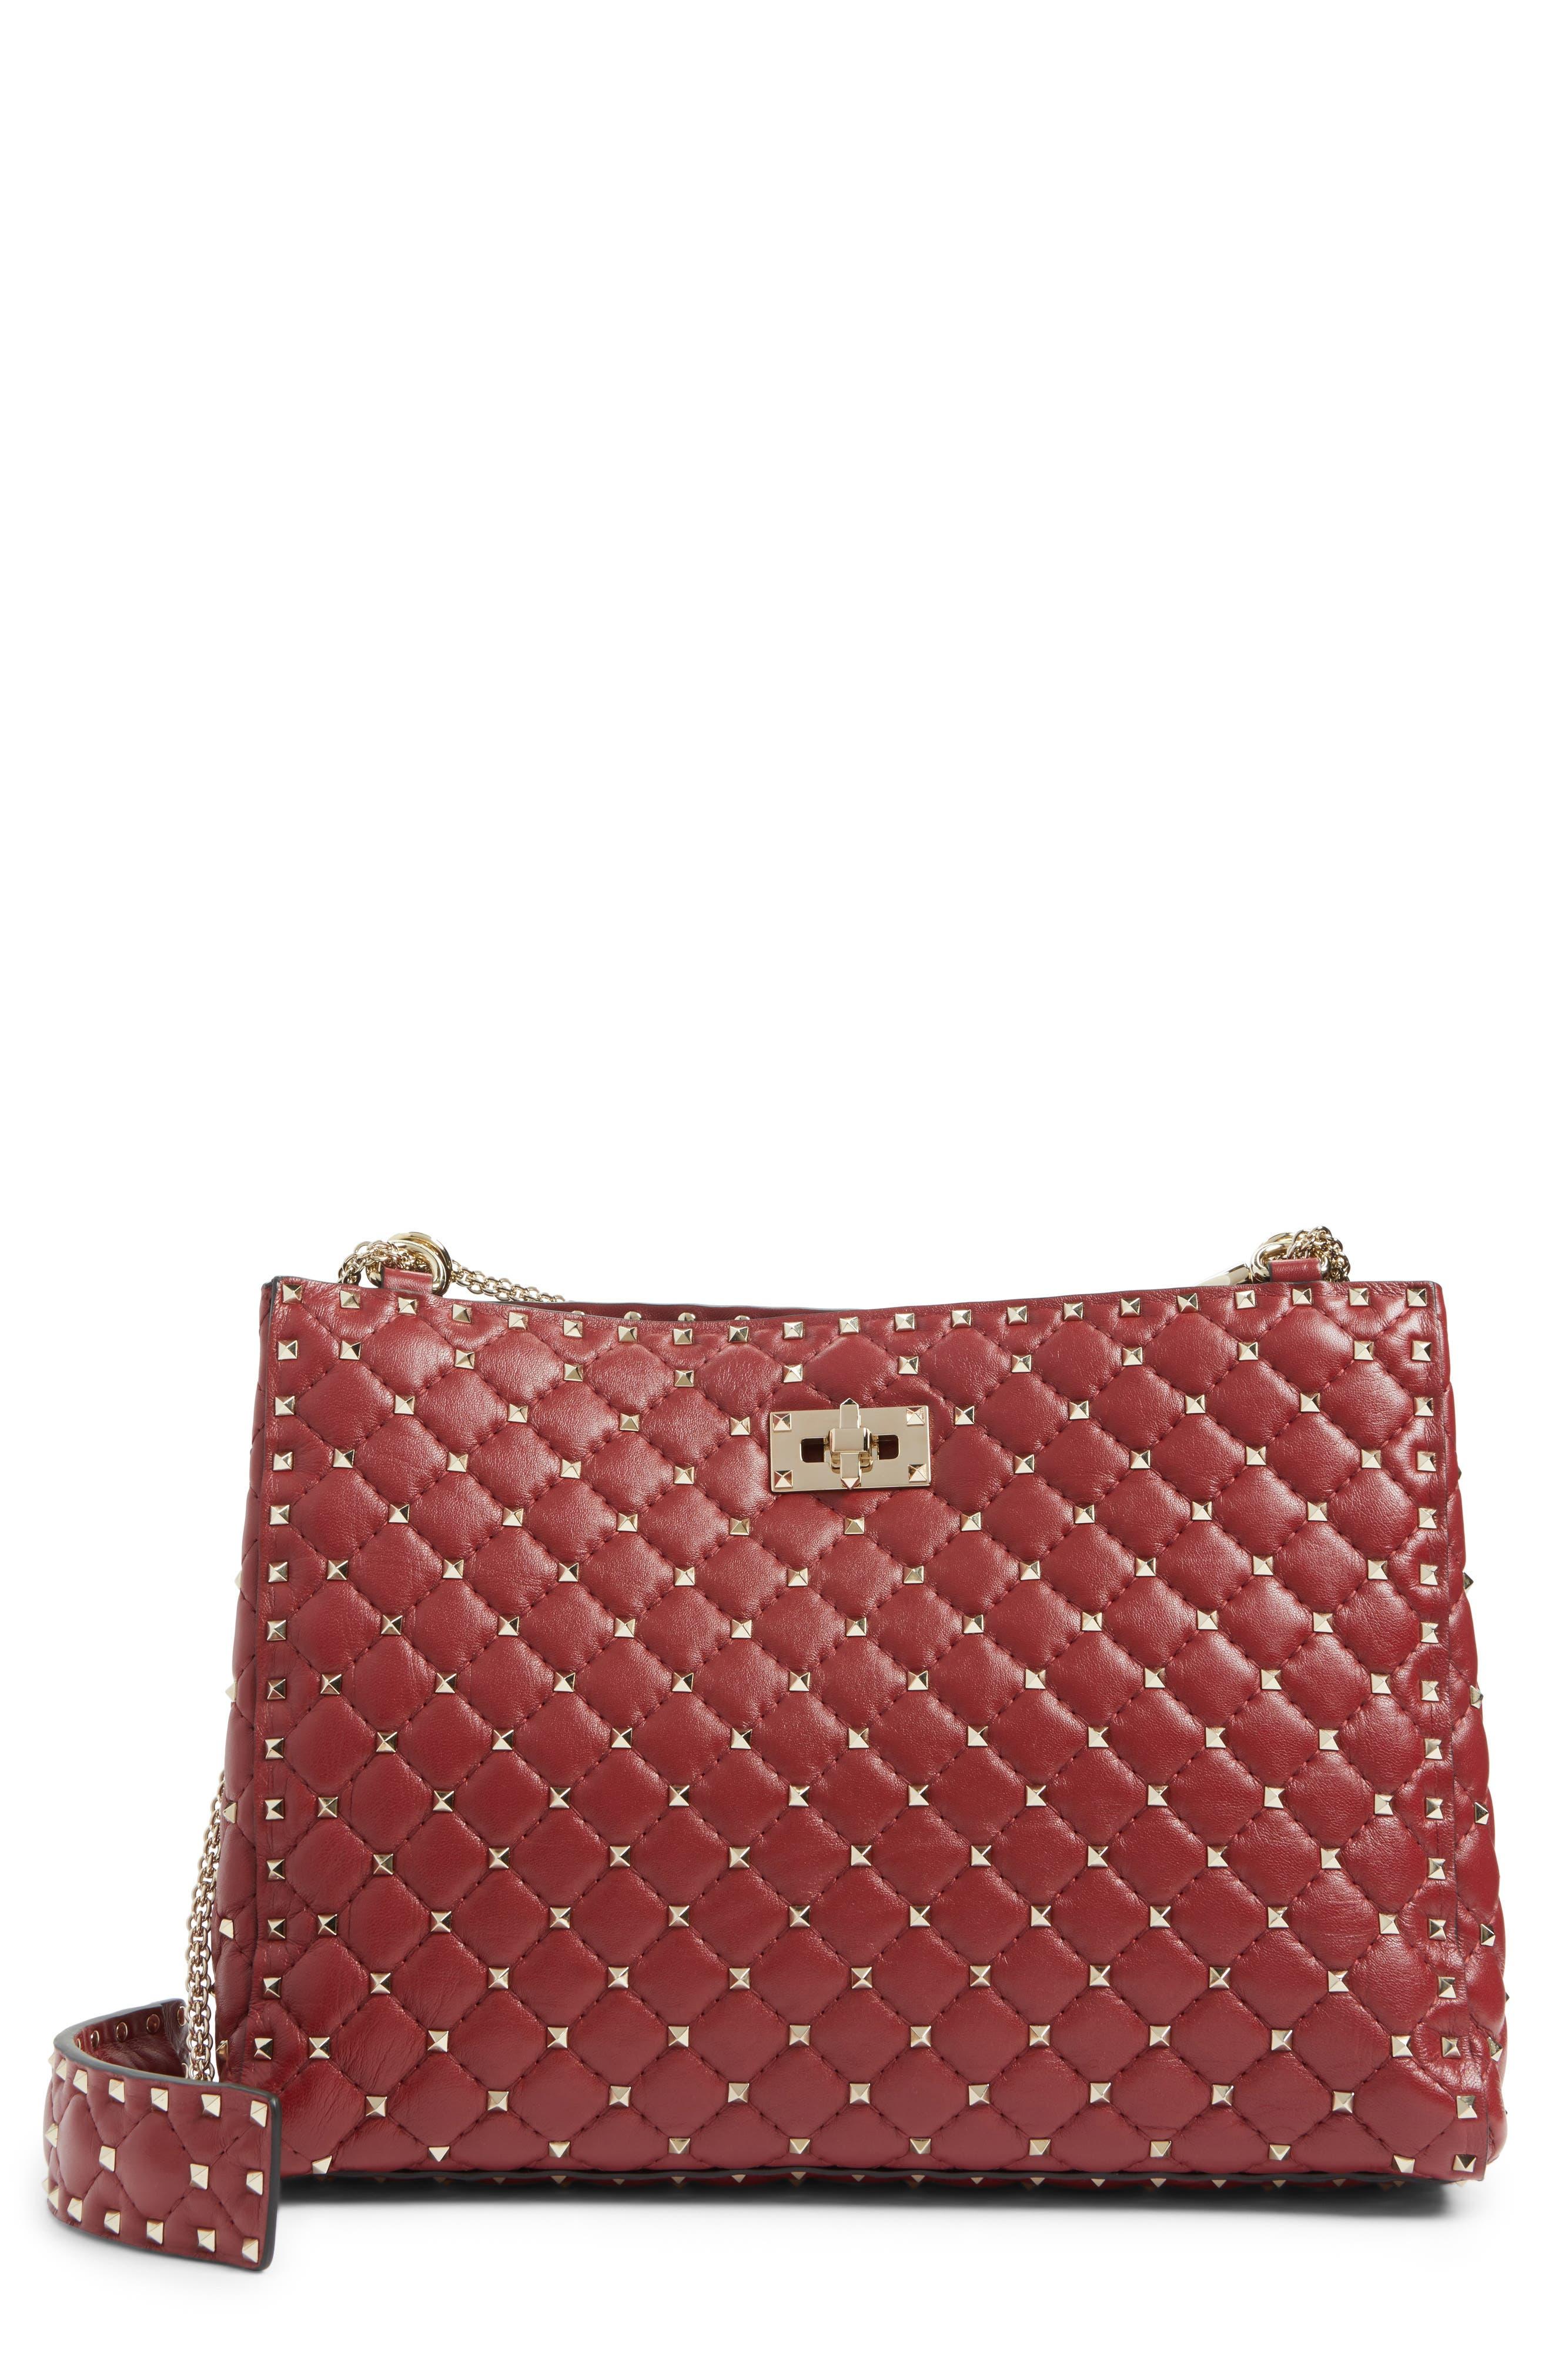 Rockstud Spike Quilted Lambskin Leather Shoulder Bag,                         Main,                         color, ROSSO